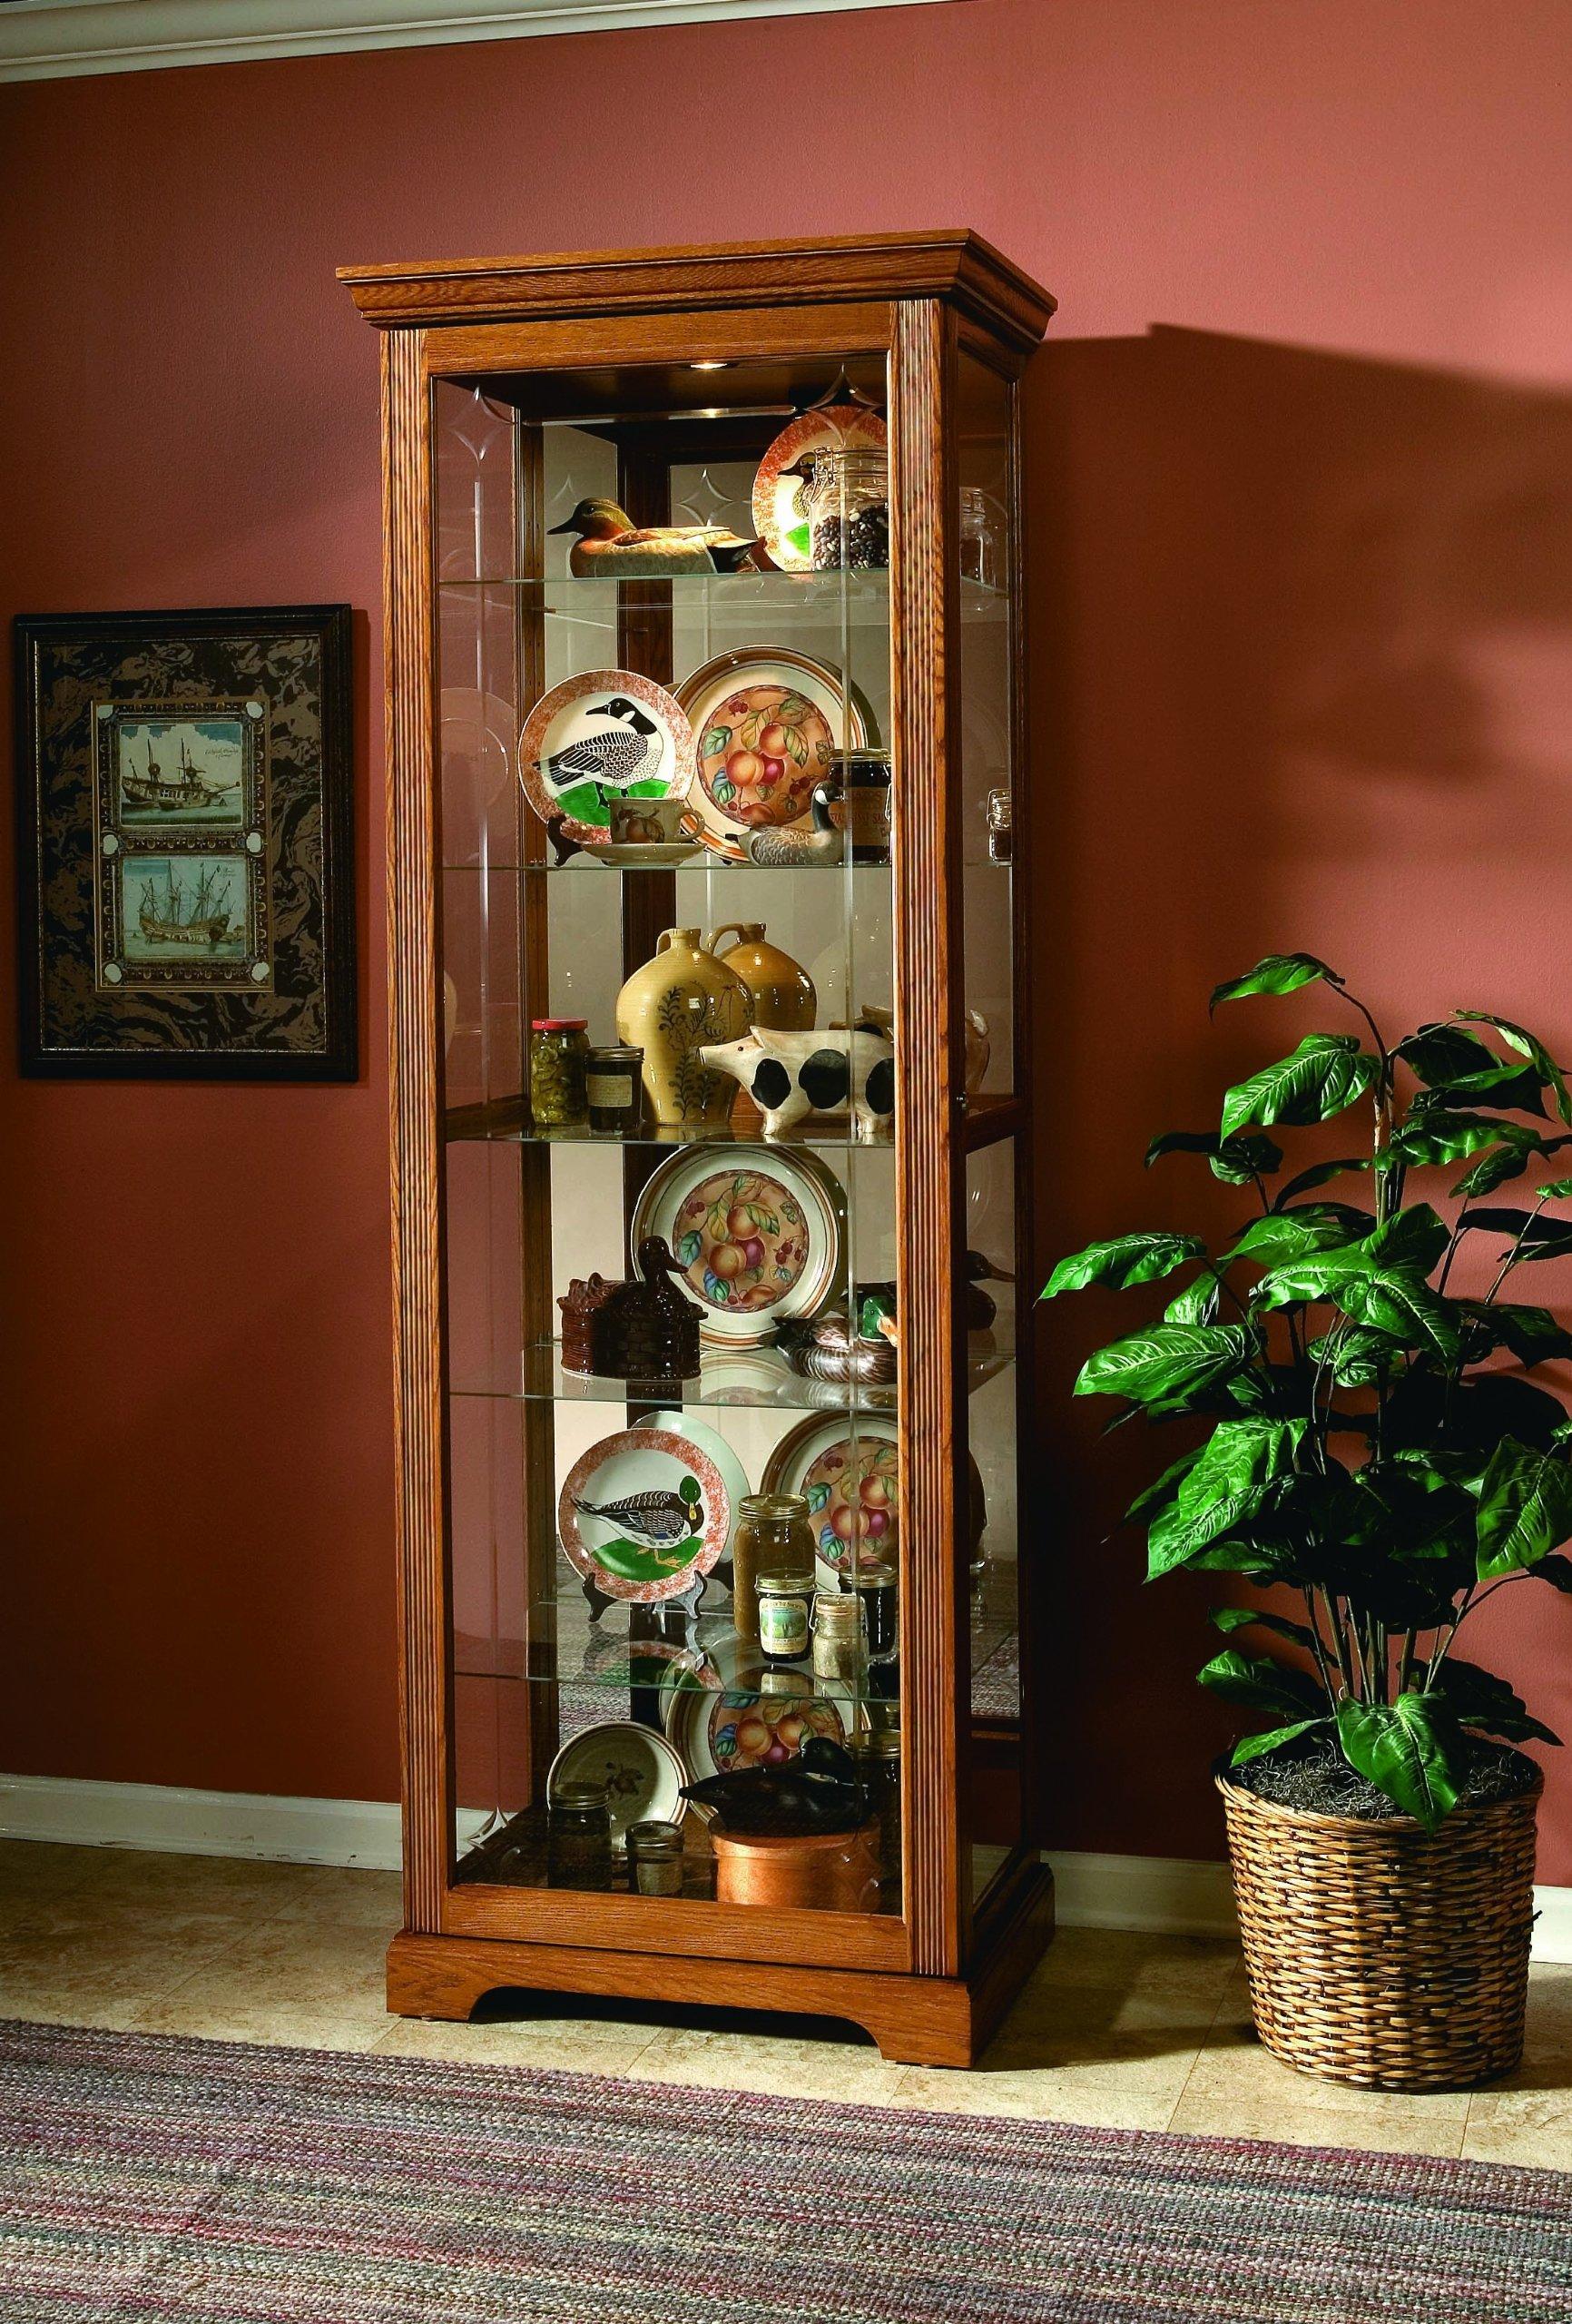 Pulaski Two Way Sliding Door Curio, 30 by 20 by 80-Inch, Golden Oak II Finish, Medium Brown by Pulaski